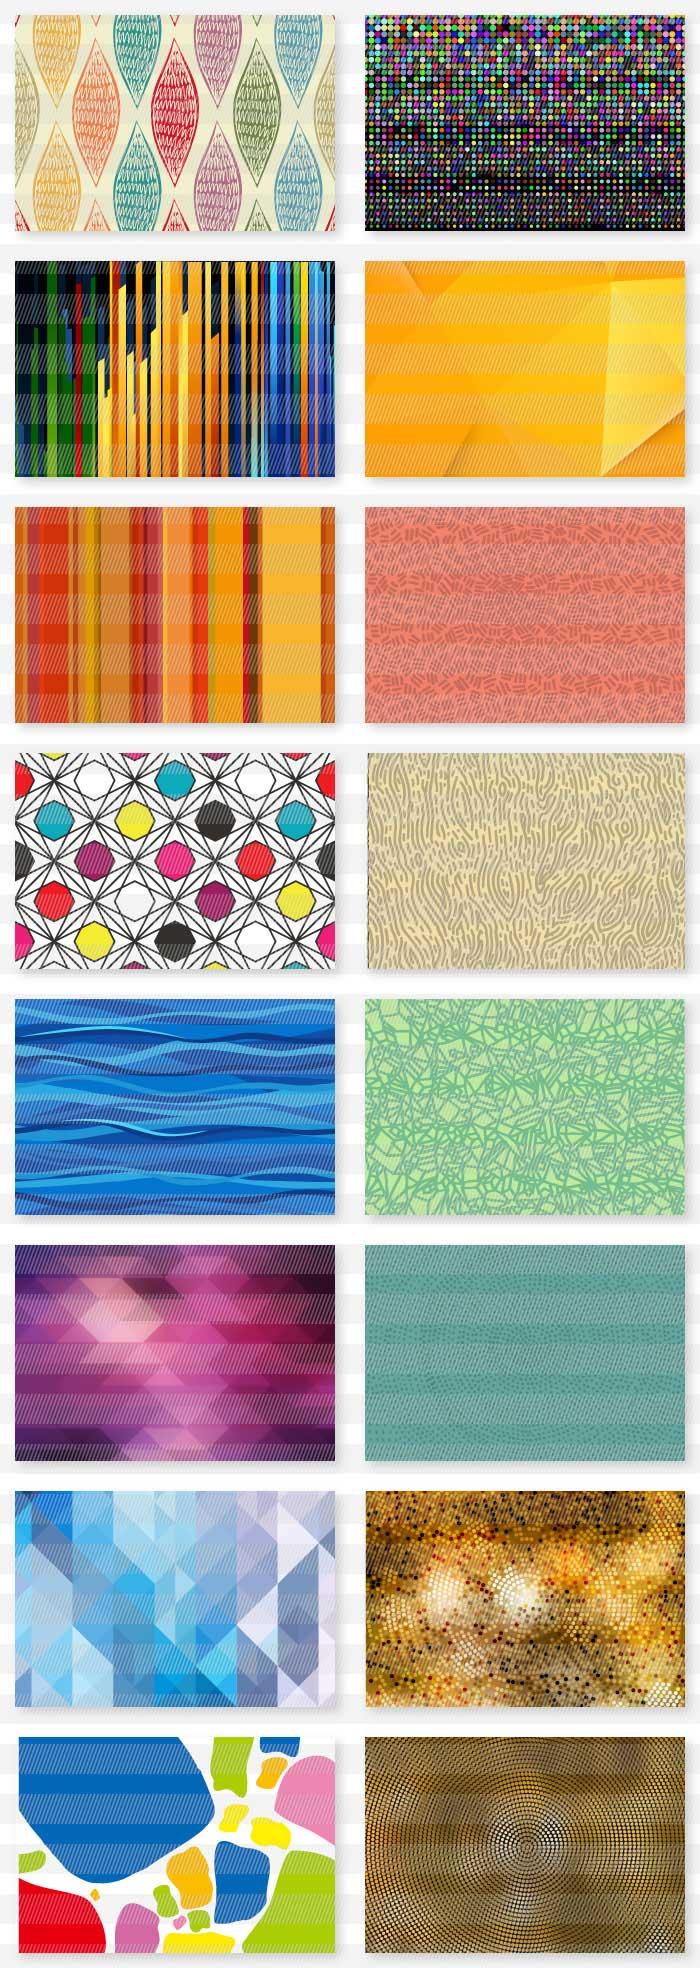 抽象模様幾何学模様の背景素材イラストレーター素材aieps商用可能